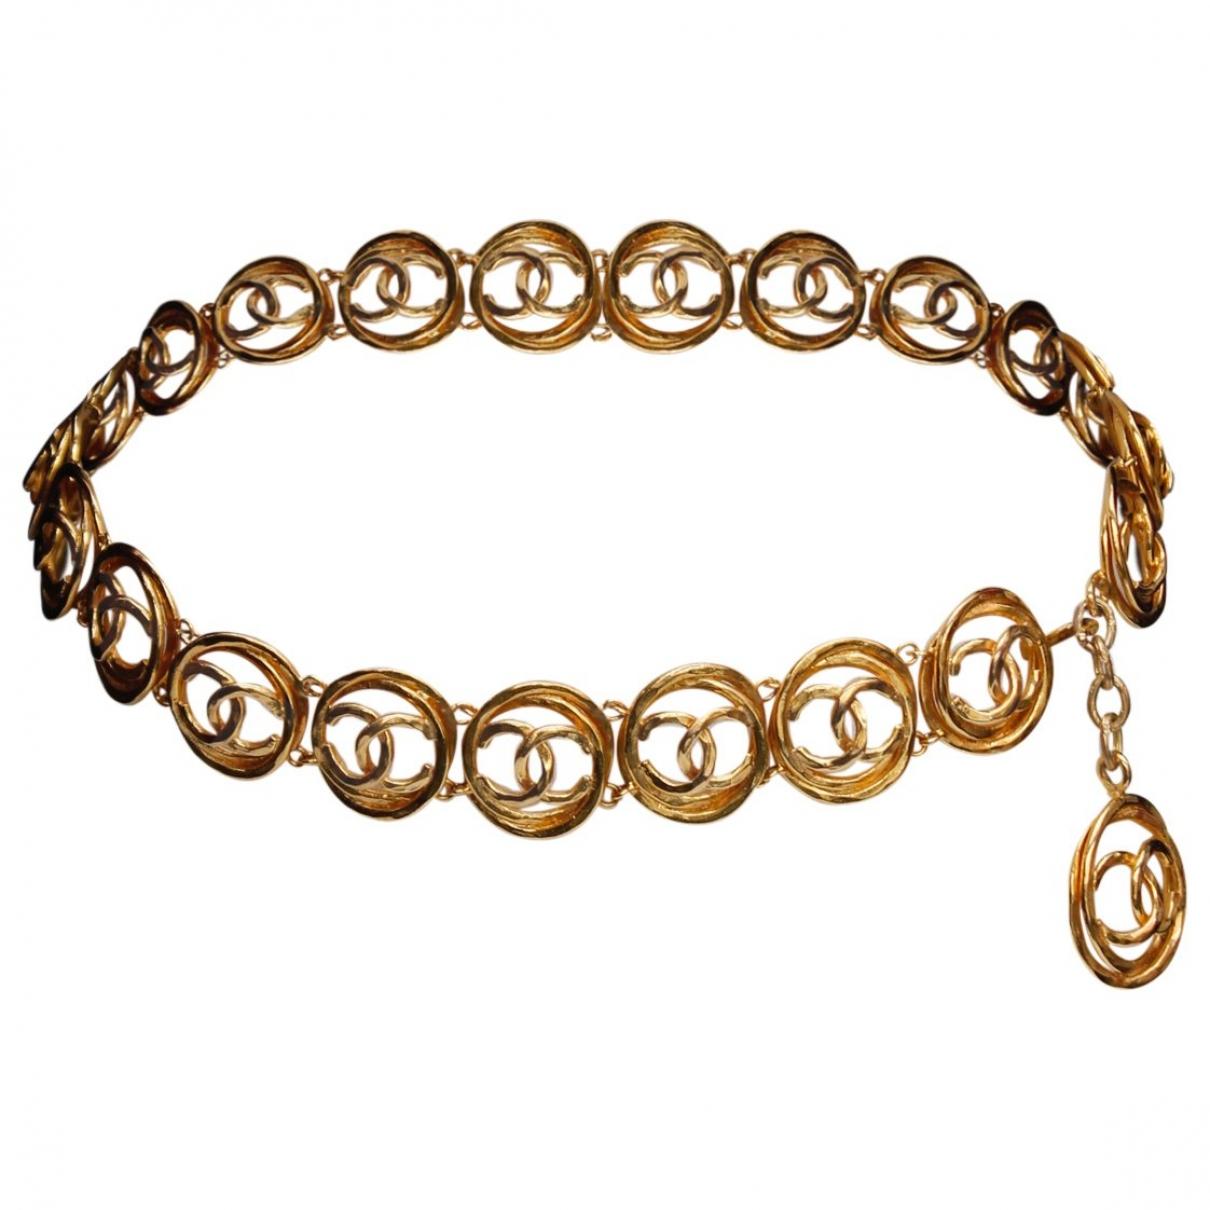 Chanel \N Gold Metal belt for Women 85 cm